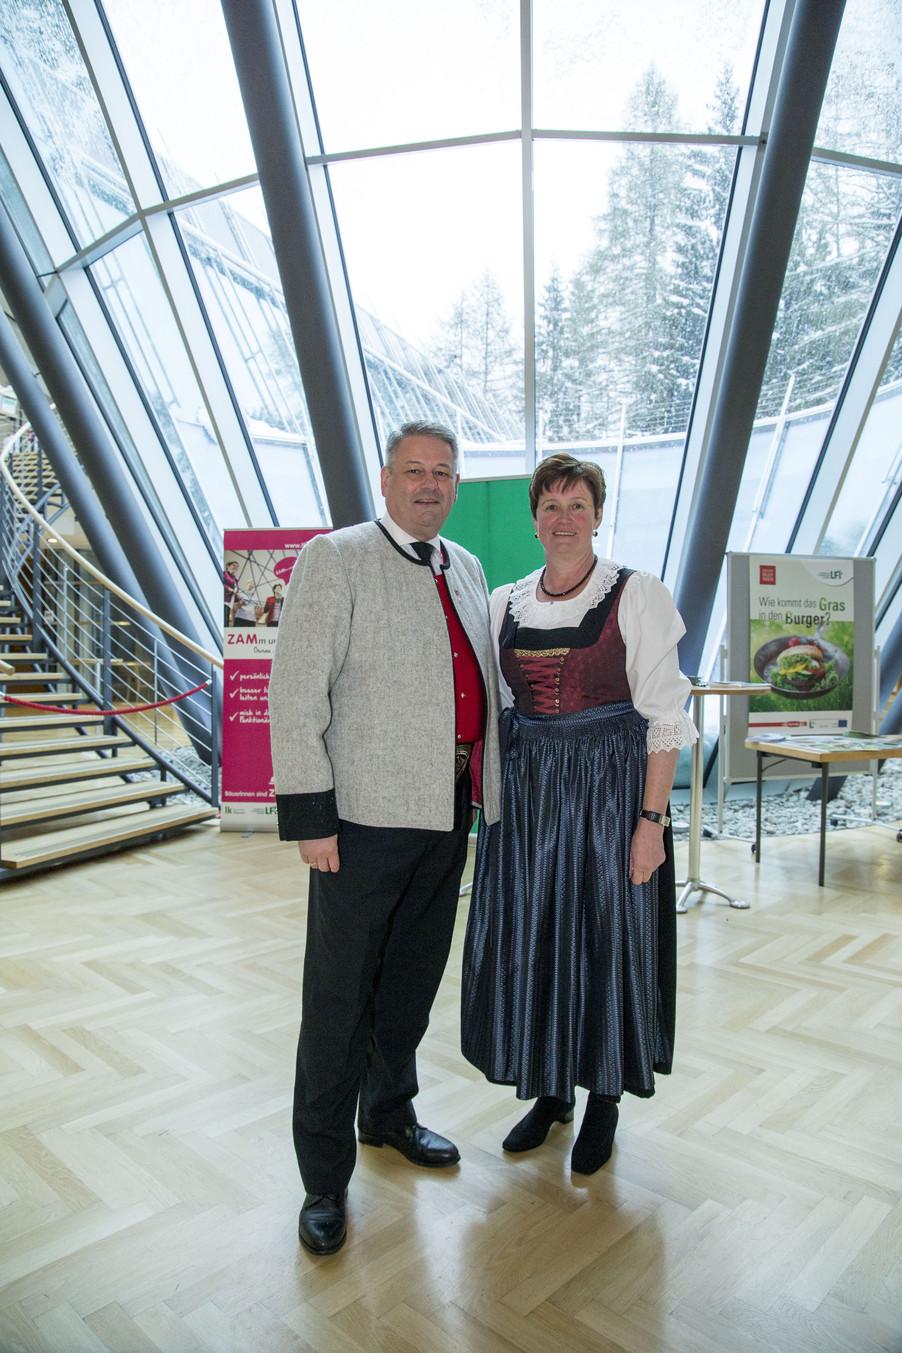 Bild 49 | Landwirtschaftsminister Andrä Rupprechter und Tiroler Landesbäuerin Resi Schiffmann